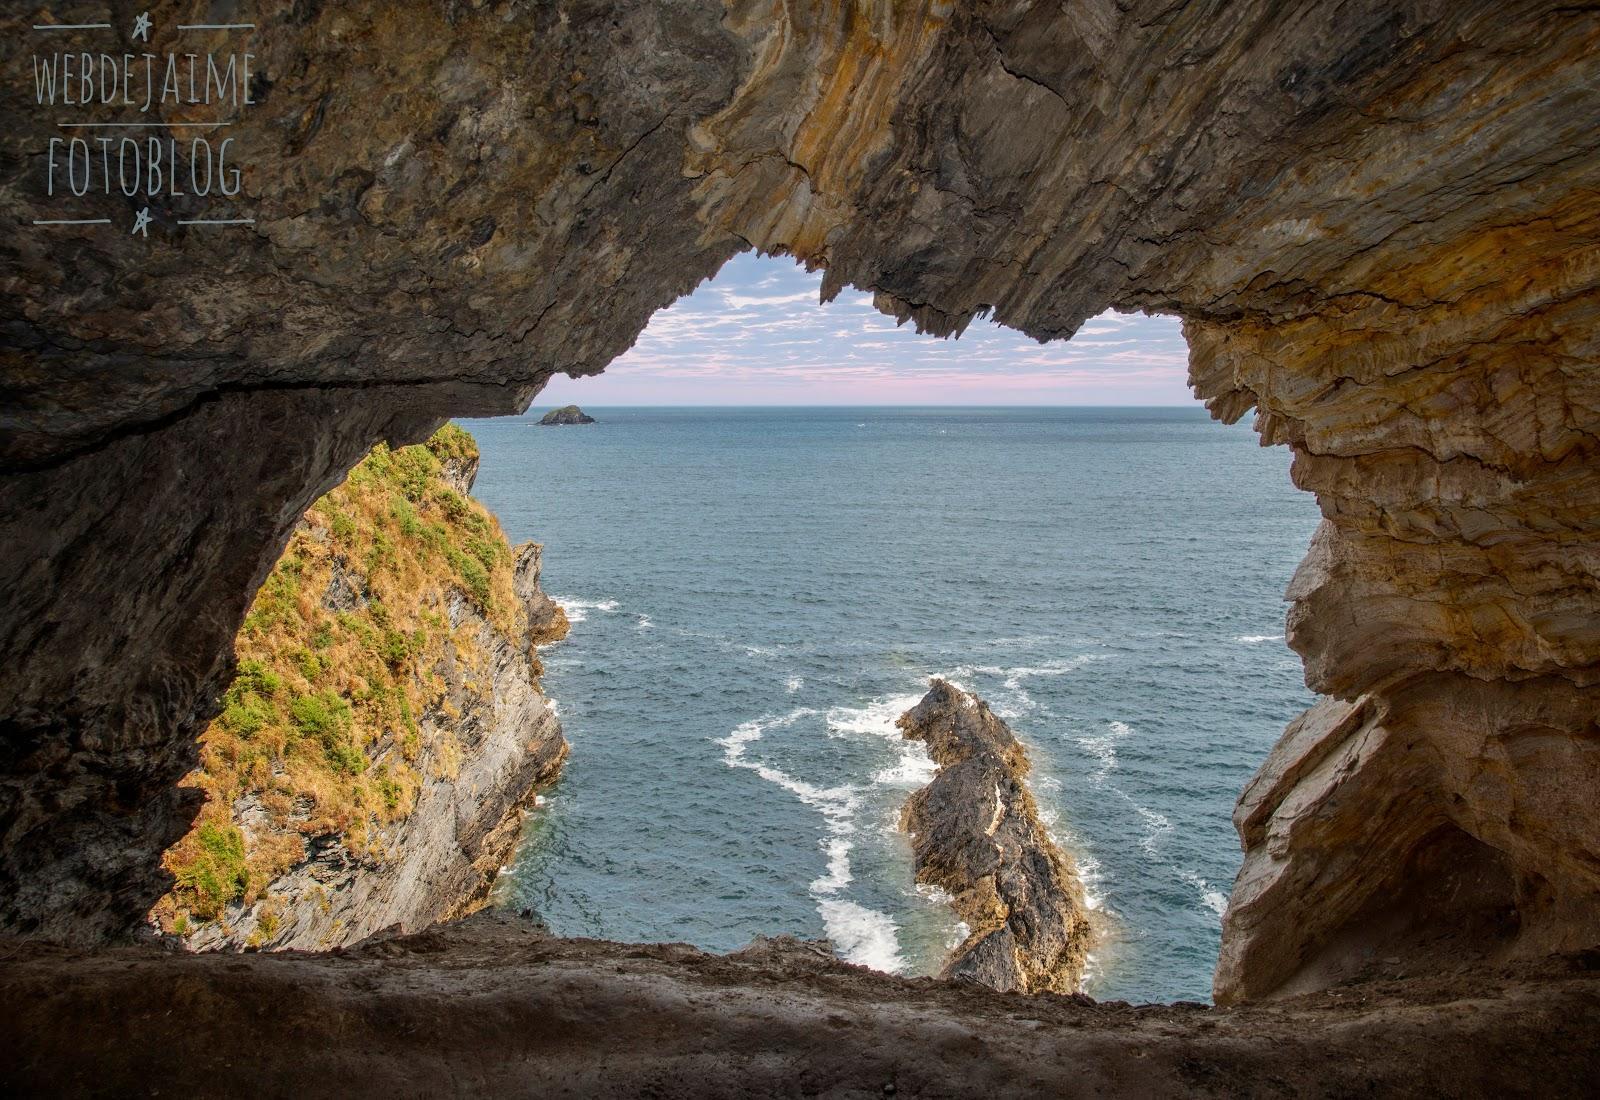 Cova da Doncela